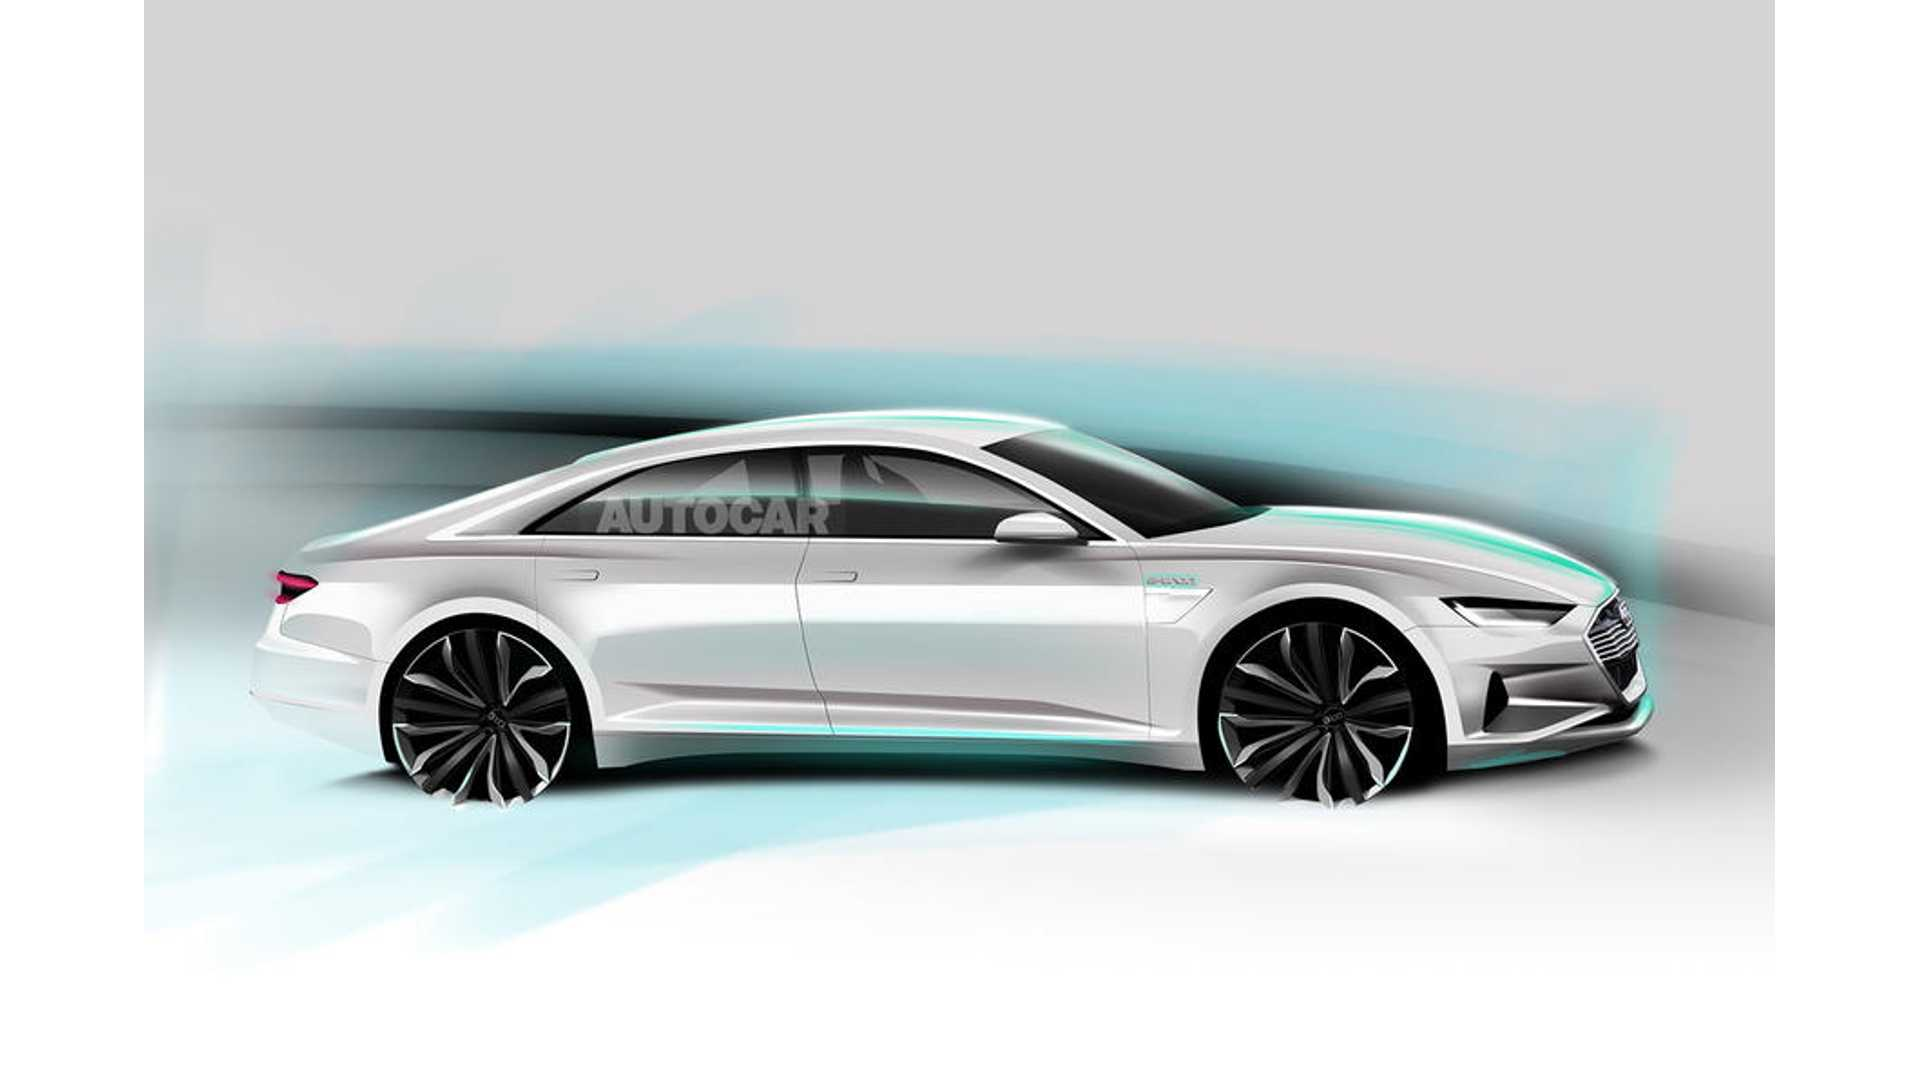 2020 Audi Q6 Rumors, E-Tron, Release Date >> Audi A9 E Tron Electric Car To Launch By 2020